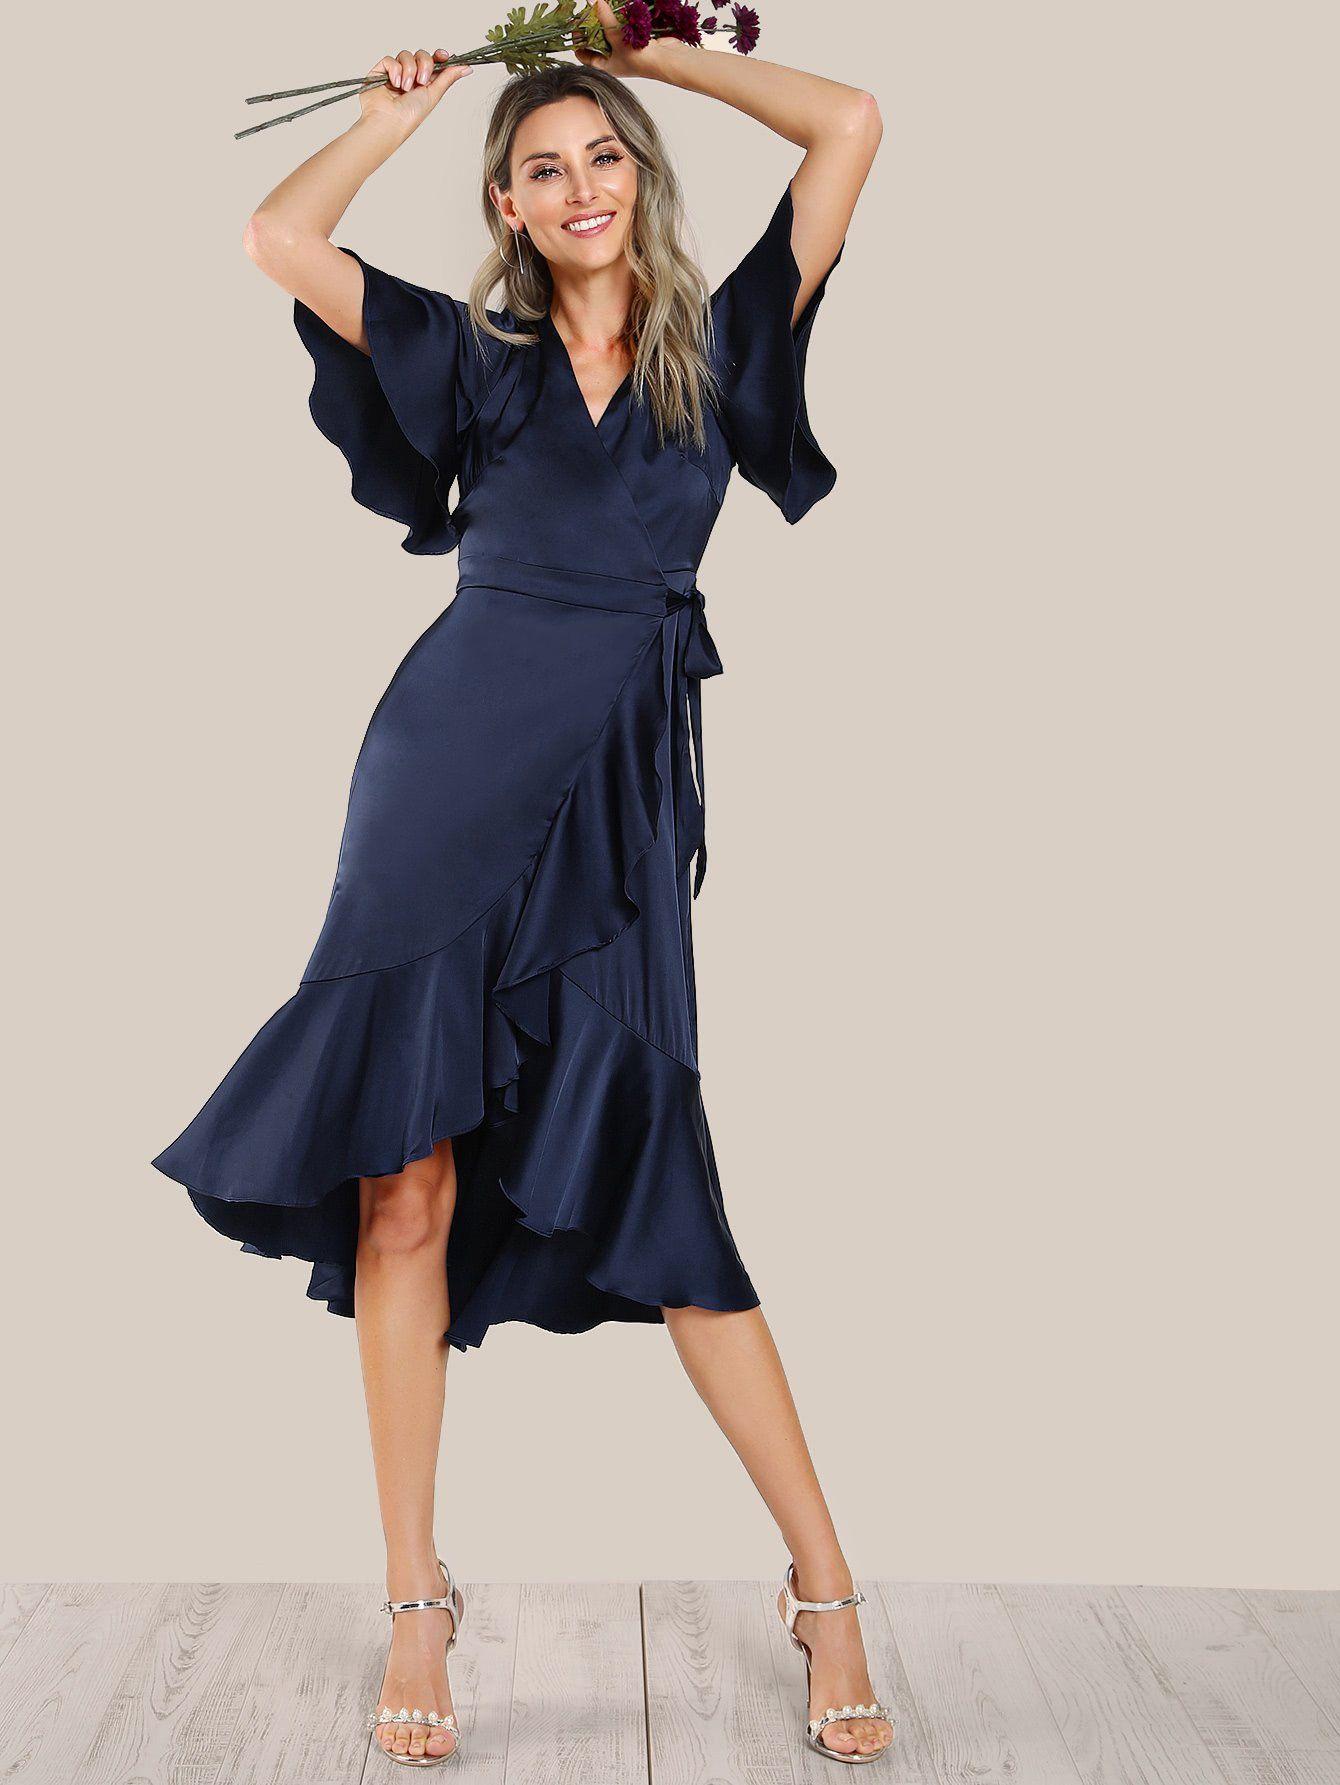 ruffle hem satin wrap tie dress | navy satin dress, tie